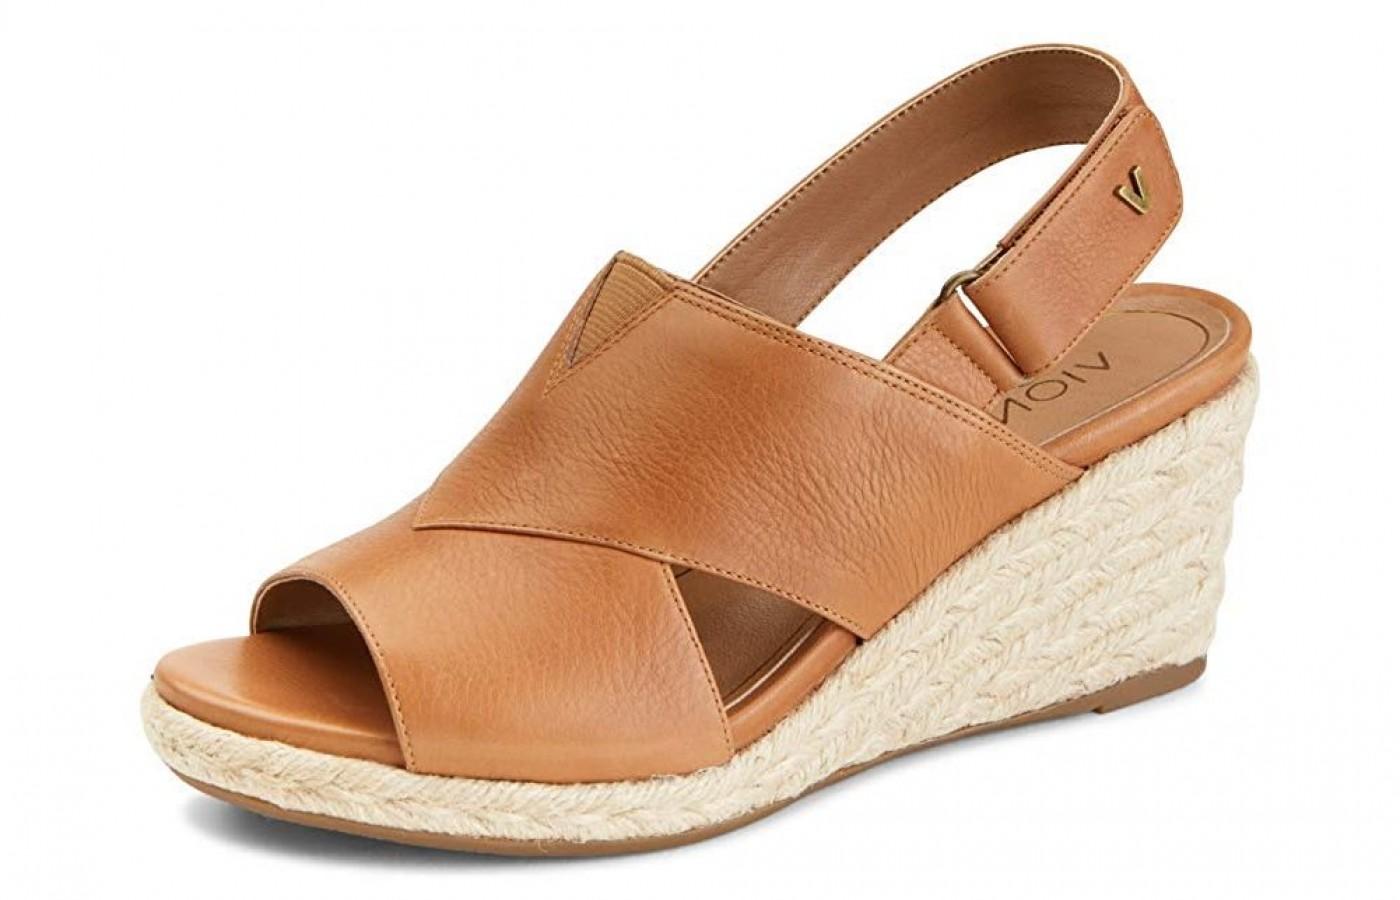 Vionic Tulum Zamar wedge sandal